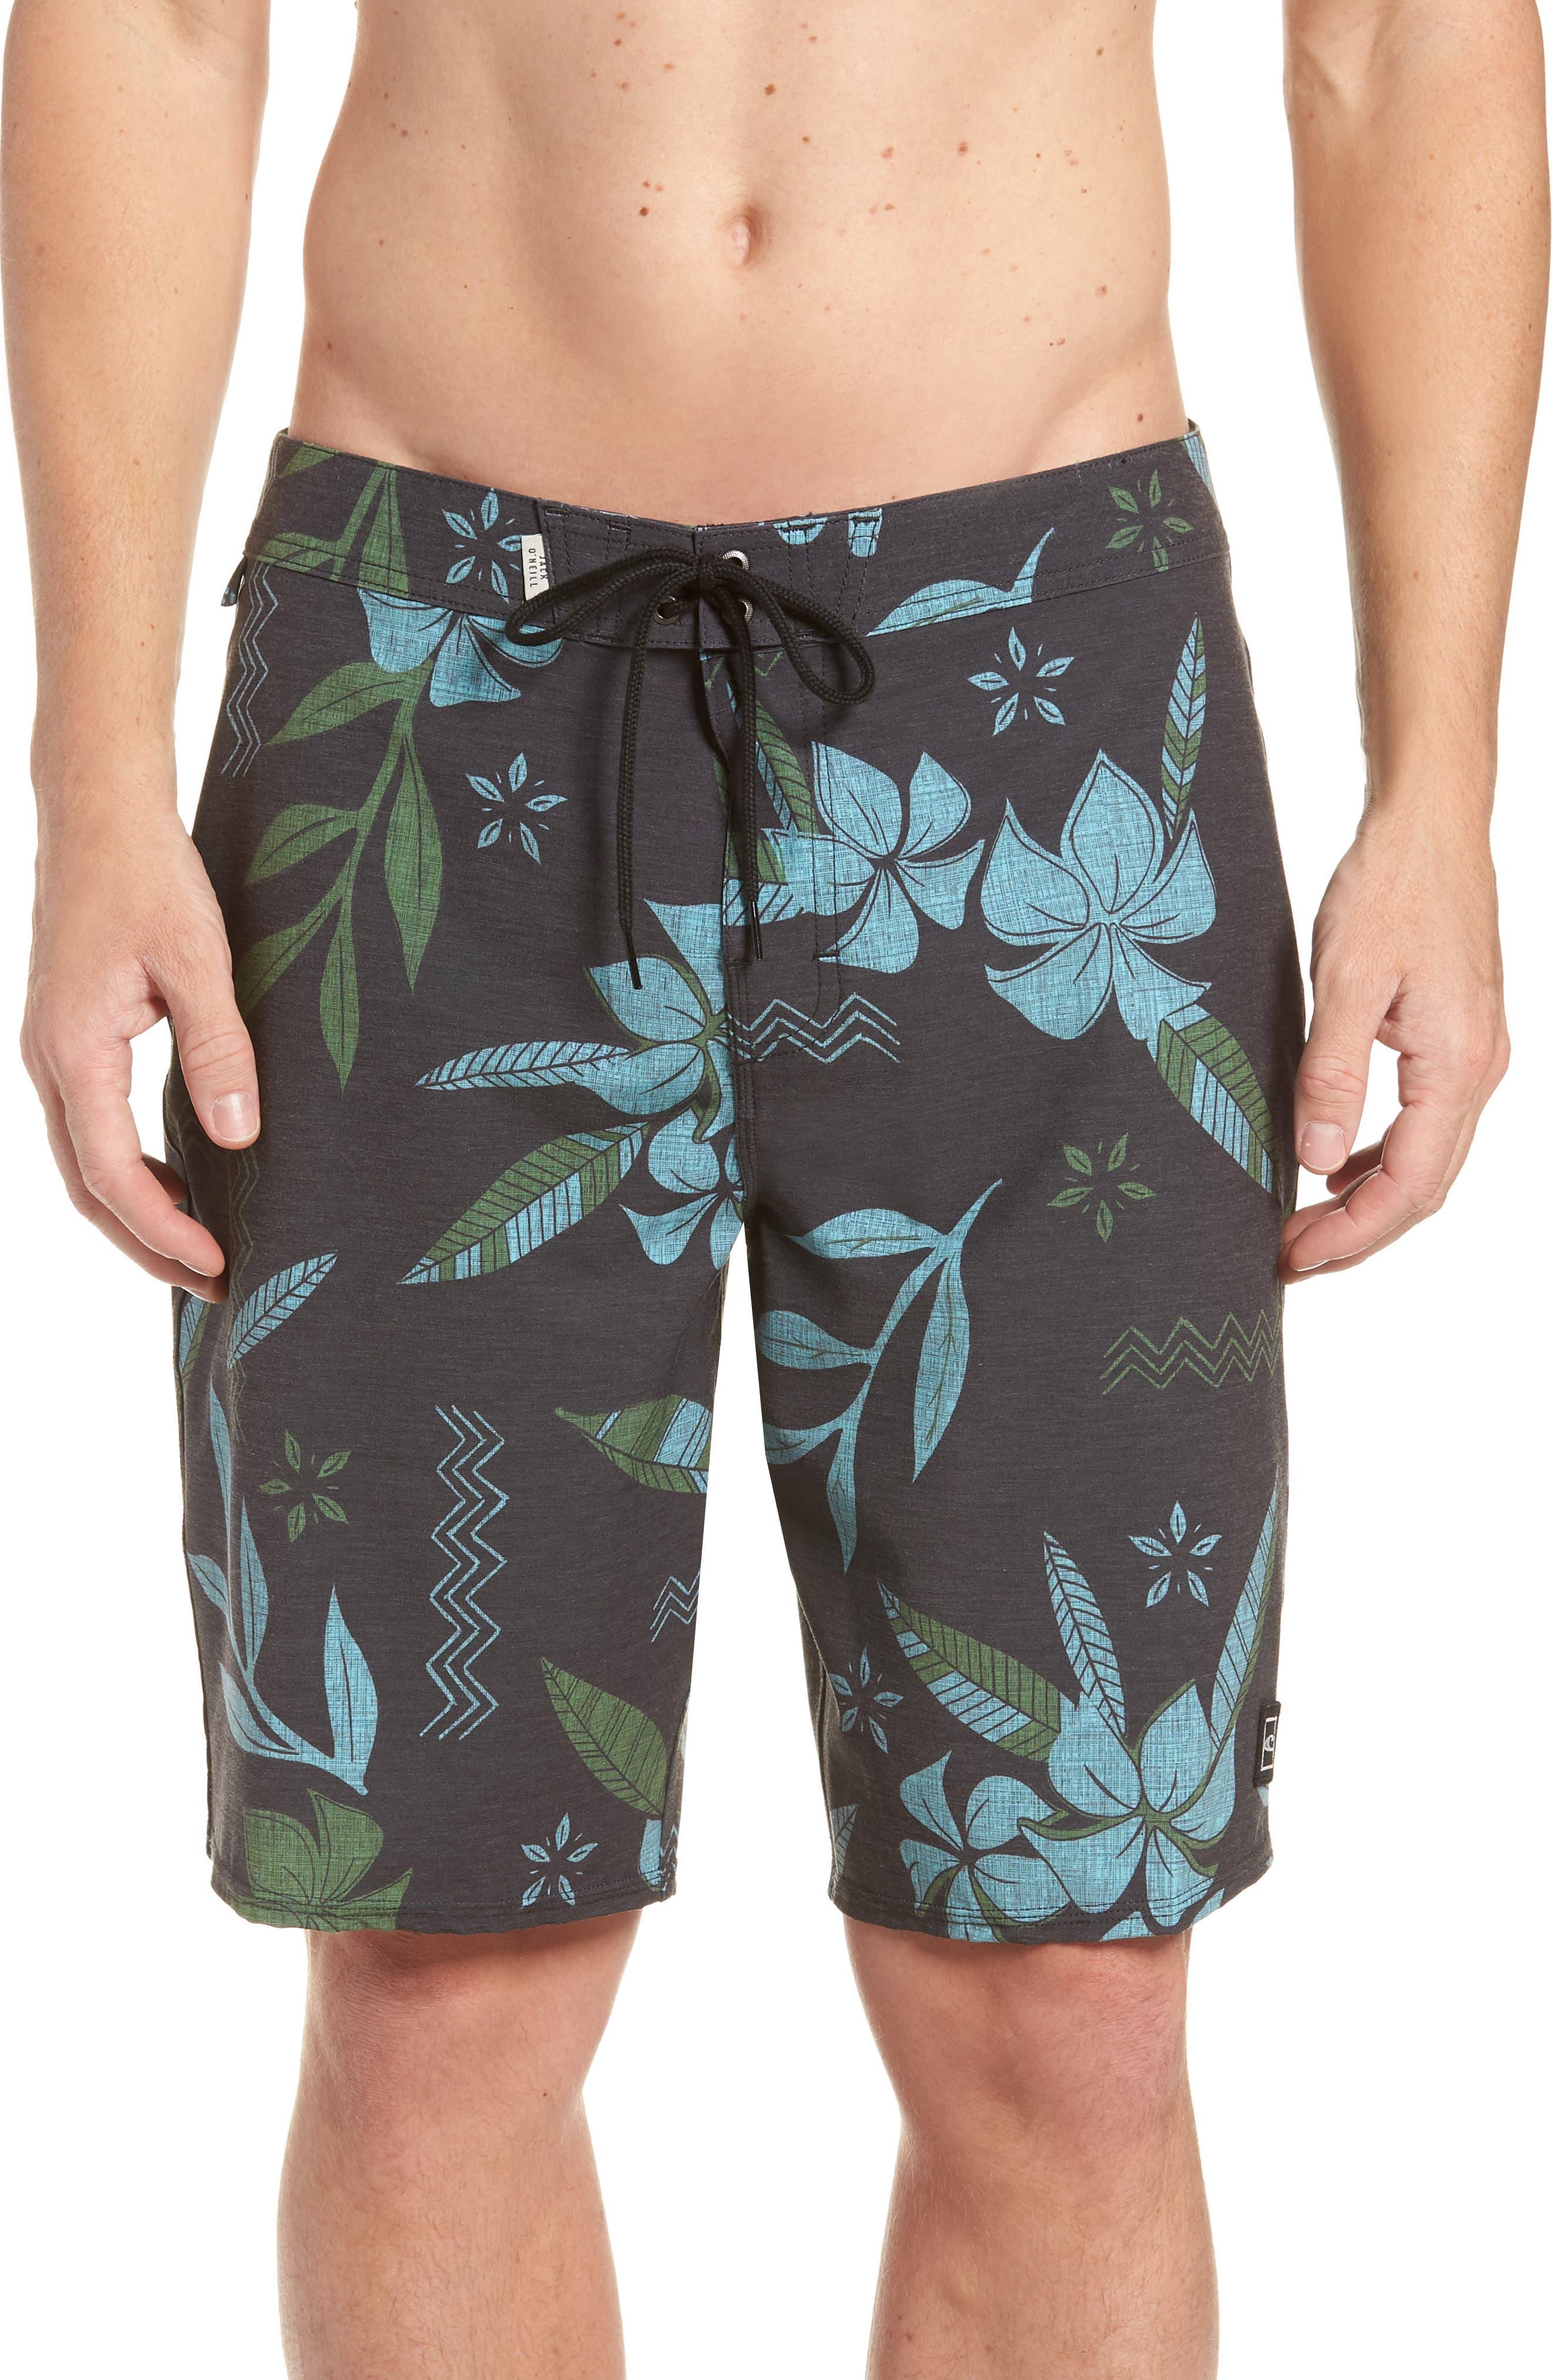 JACK O'NEILL Maui Board Shorts, Main, color, 001